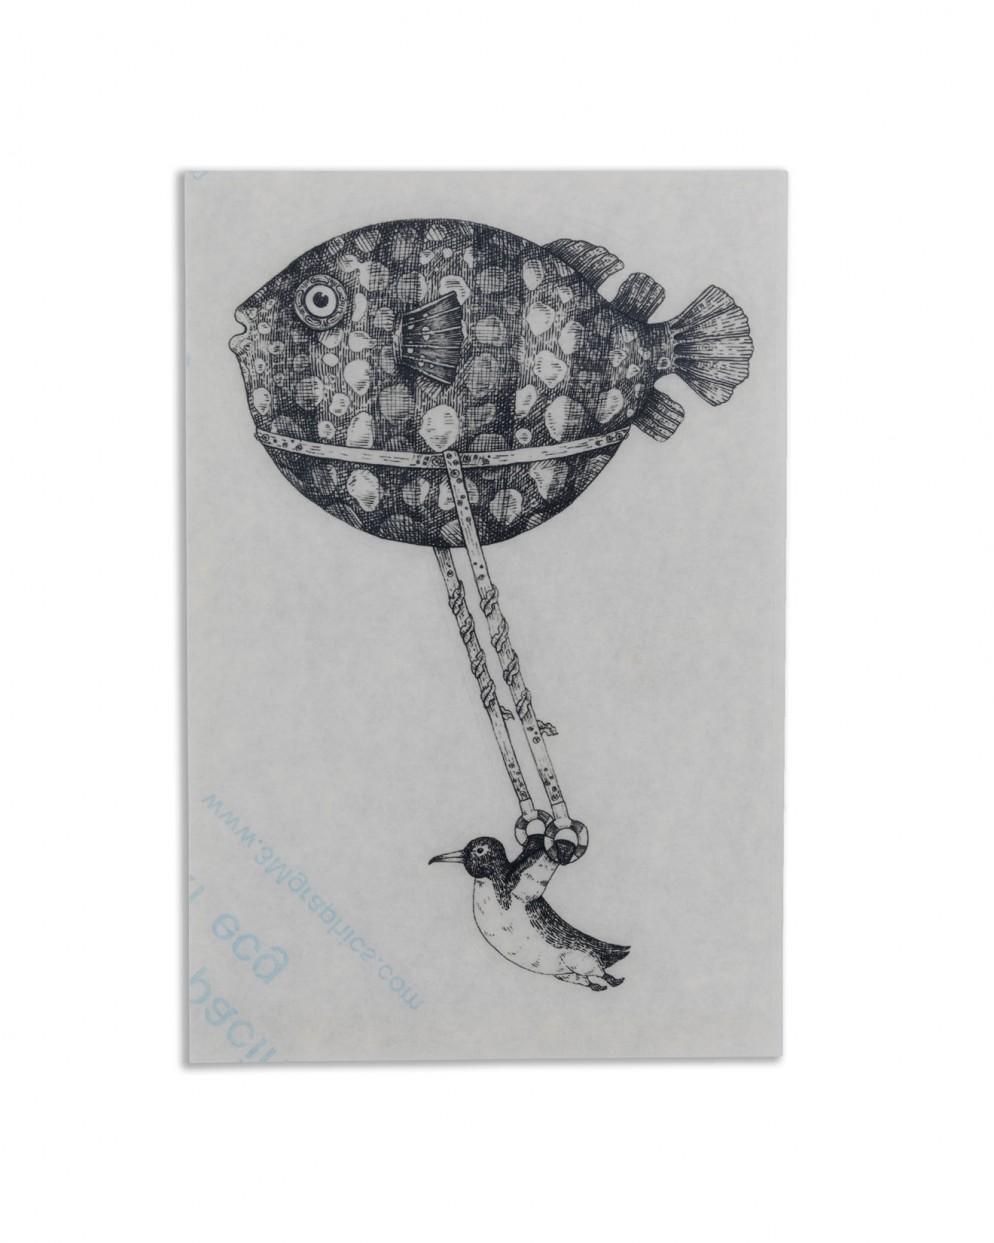 collezione-stickers-notebook-piatti-aquatic-creatures-15